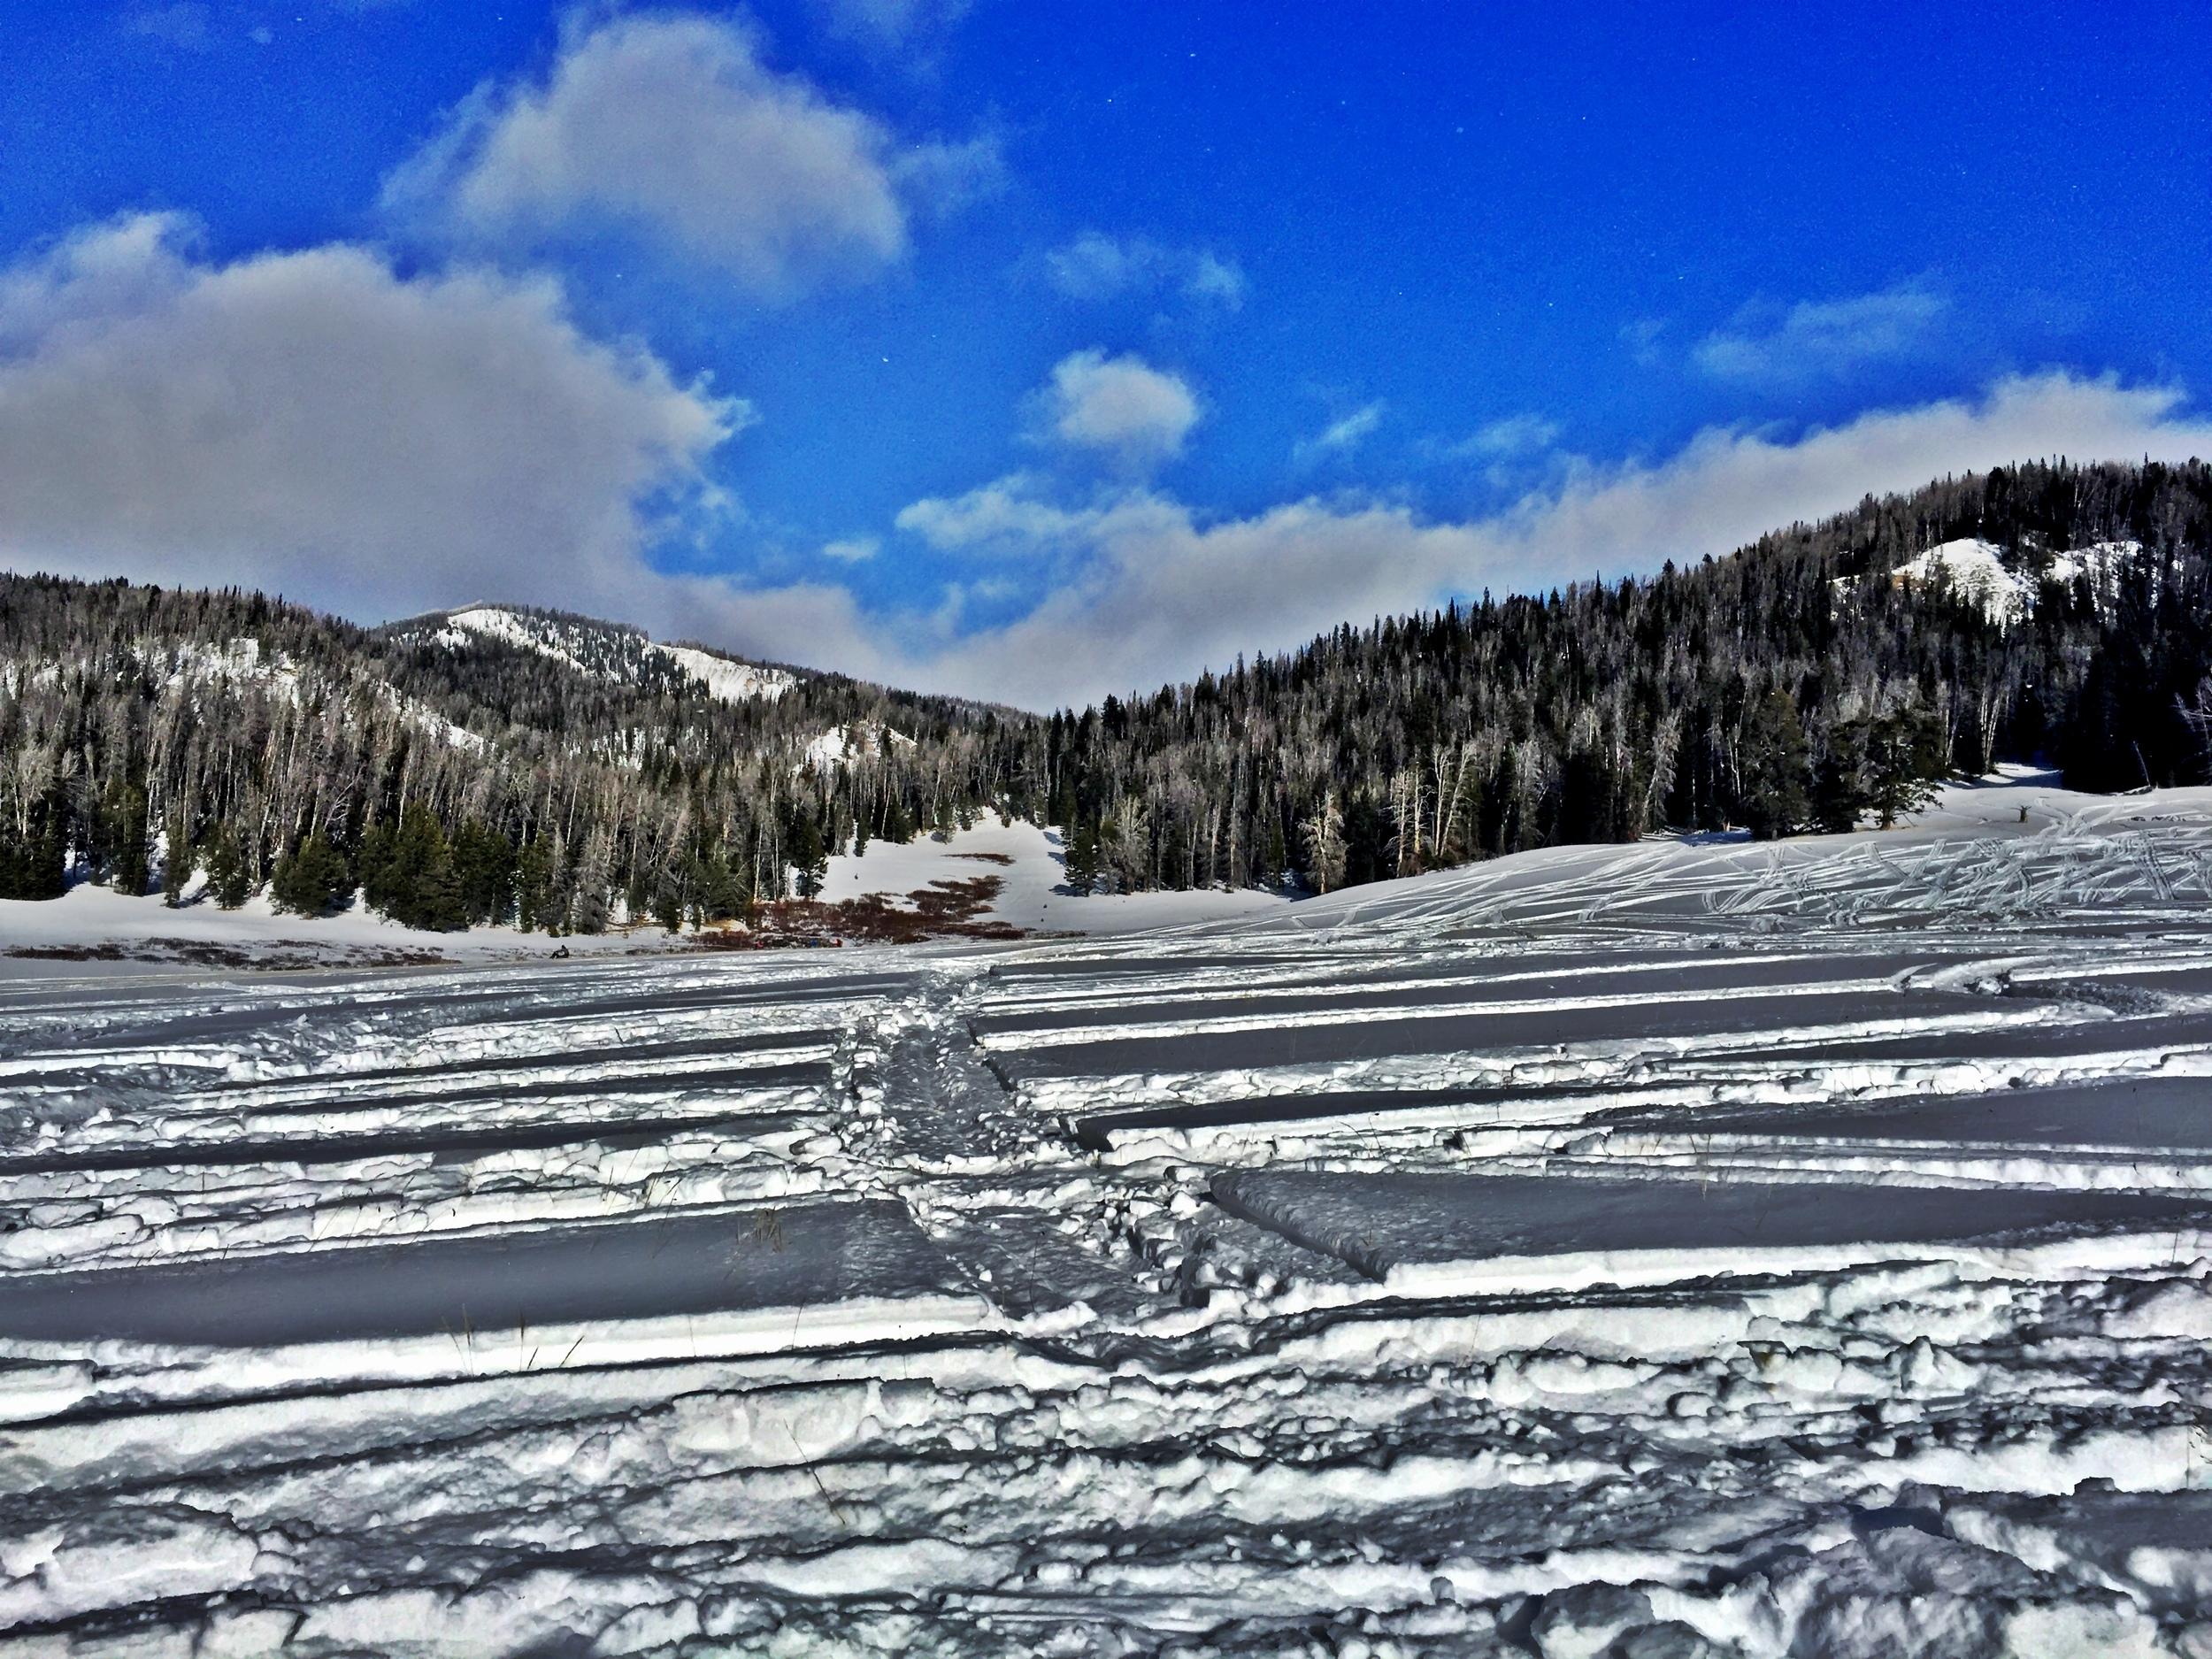 Grungy Slopes, Moran Wyoming, Togwotee Mountain Lodge 19.jpg